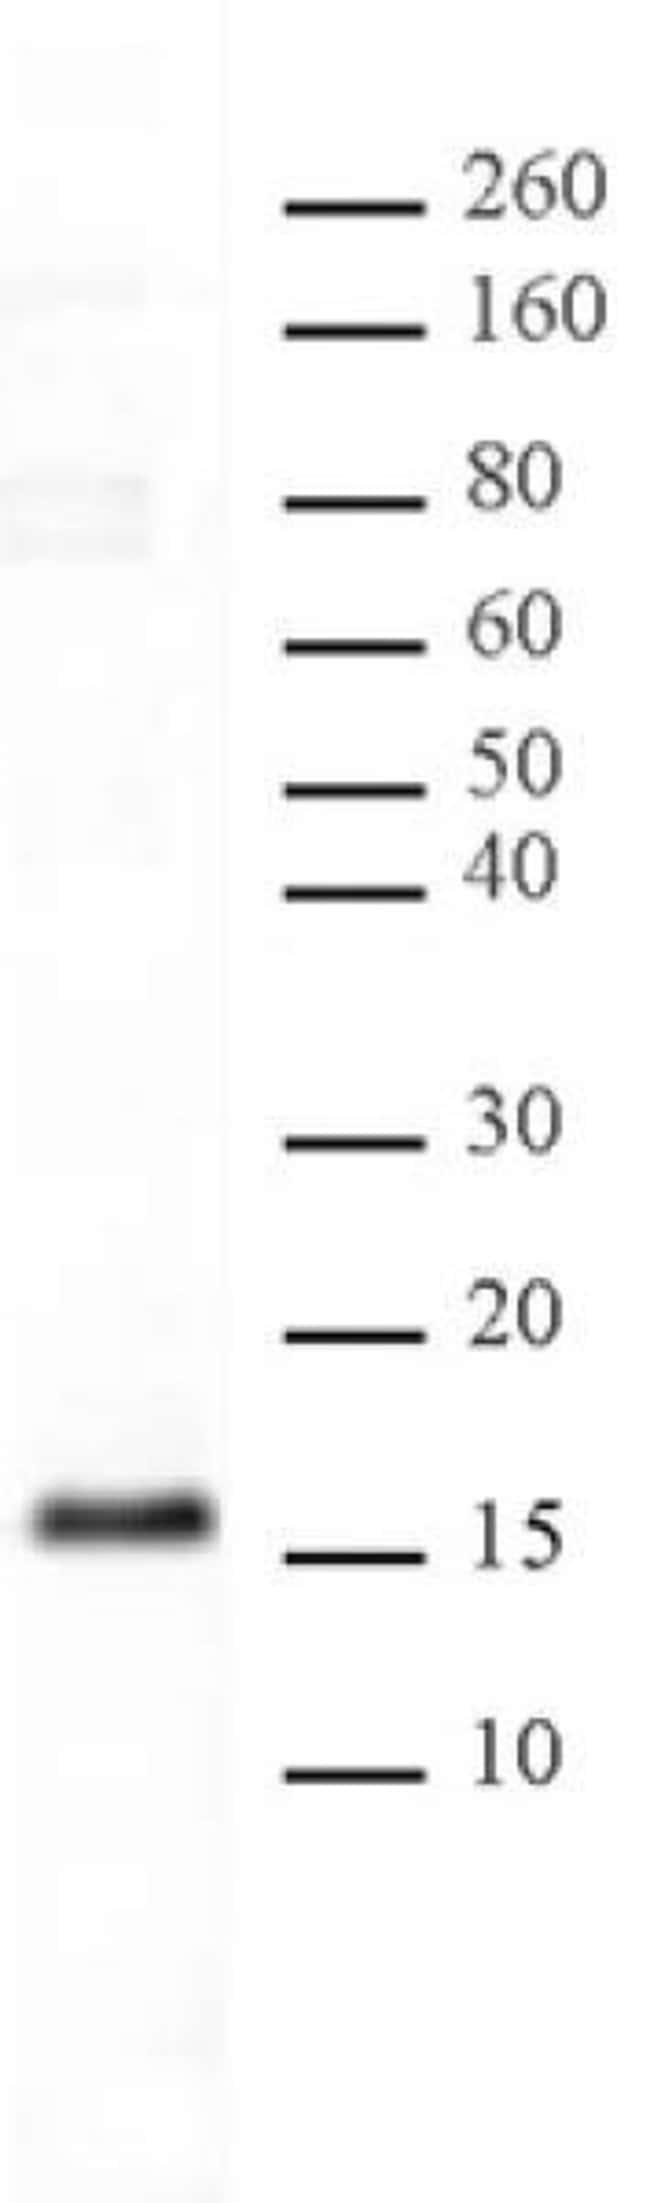 Histone H3K23me1 Rabbit anti-Human, Unconjugated, Polyclonal, Active Motif:Antibodies:Primary